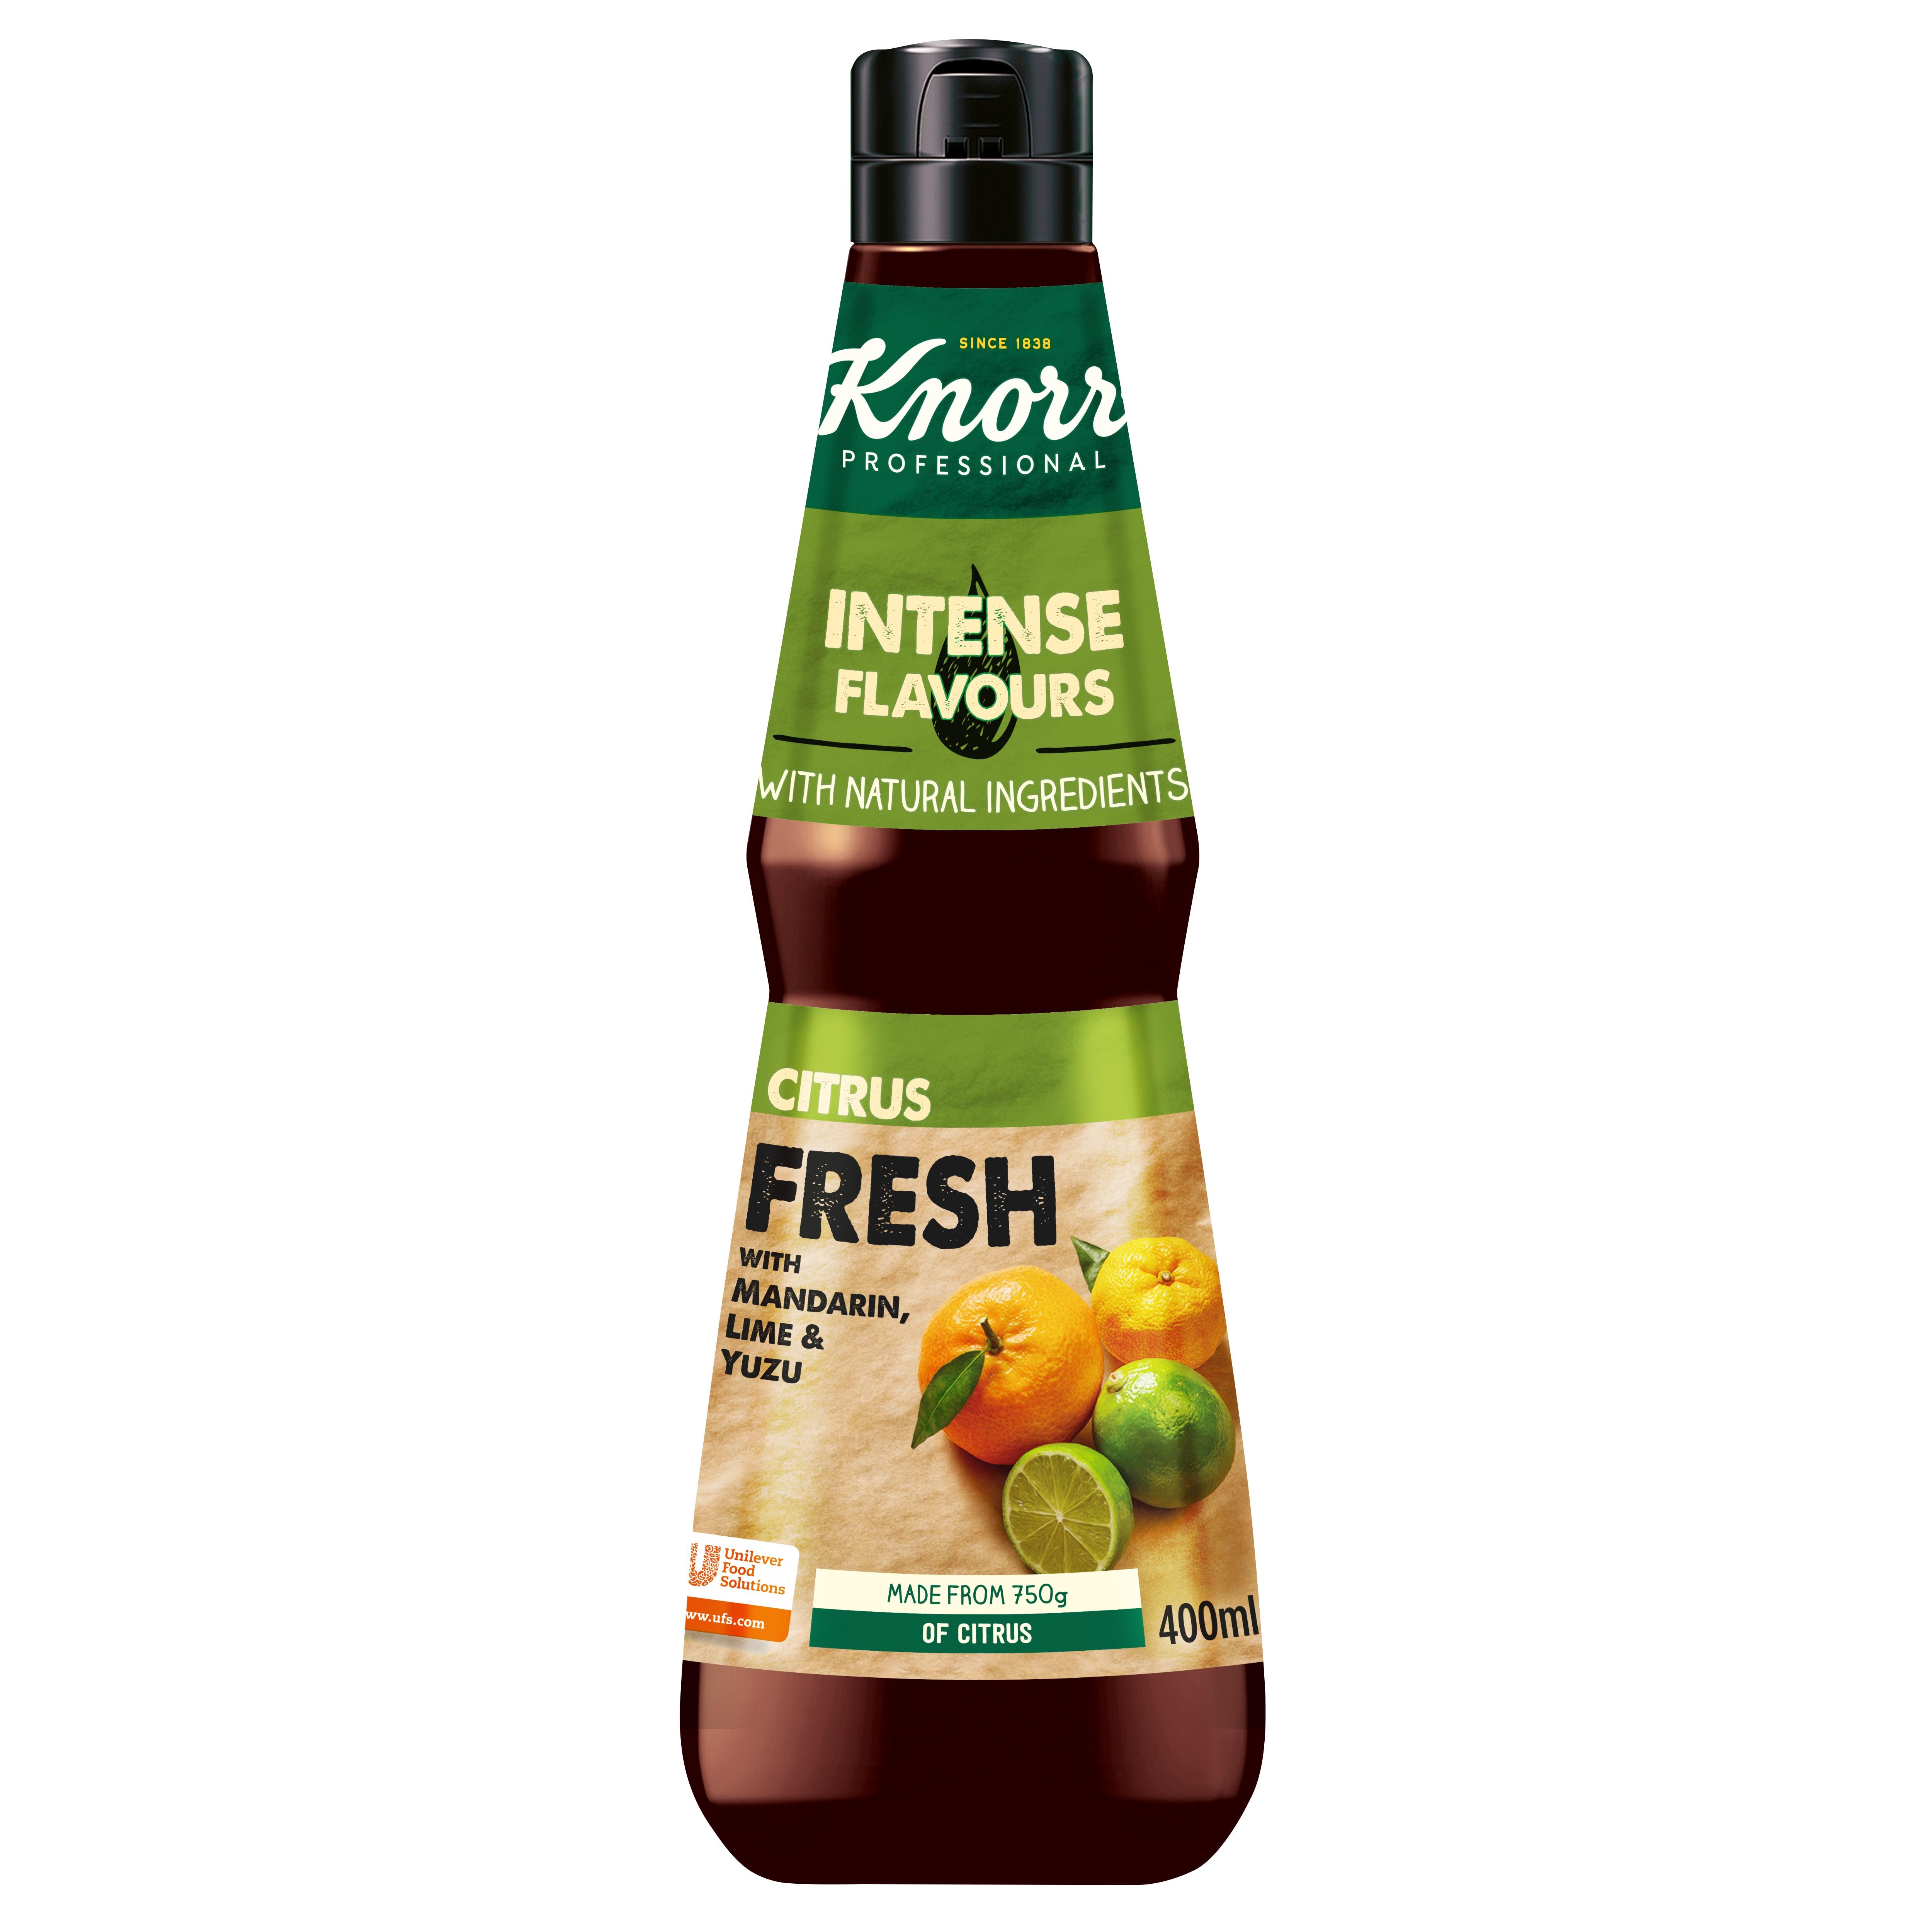 Knorr Snaga okusa - Citrus Fresh